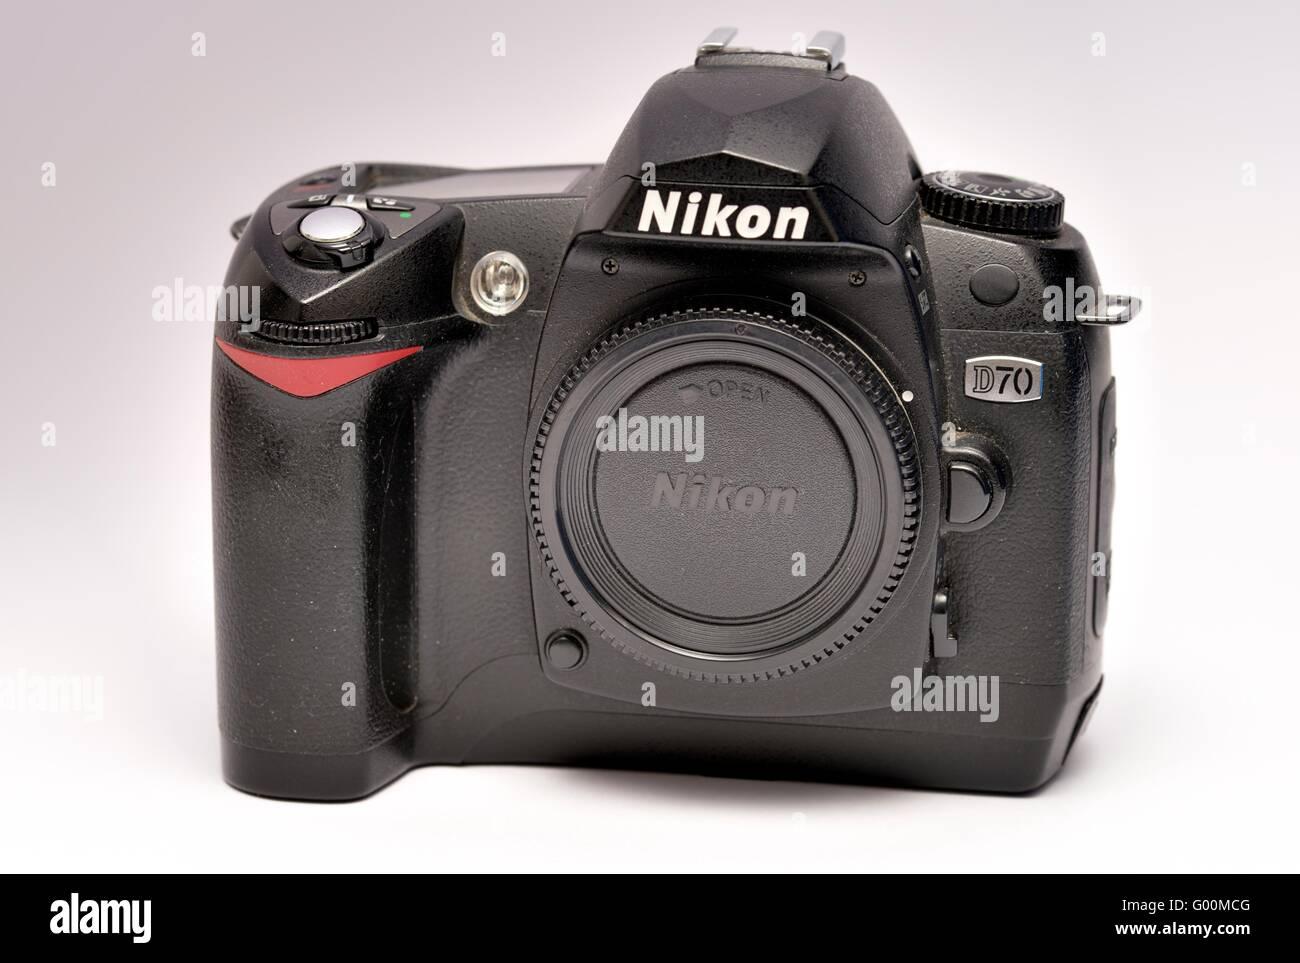 A Nikon D70 Digital SLR camera - Stock Image